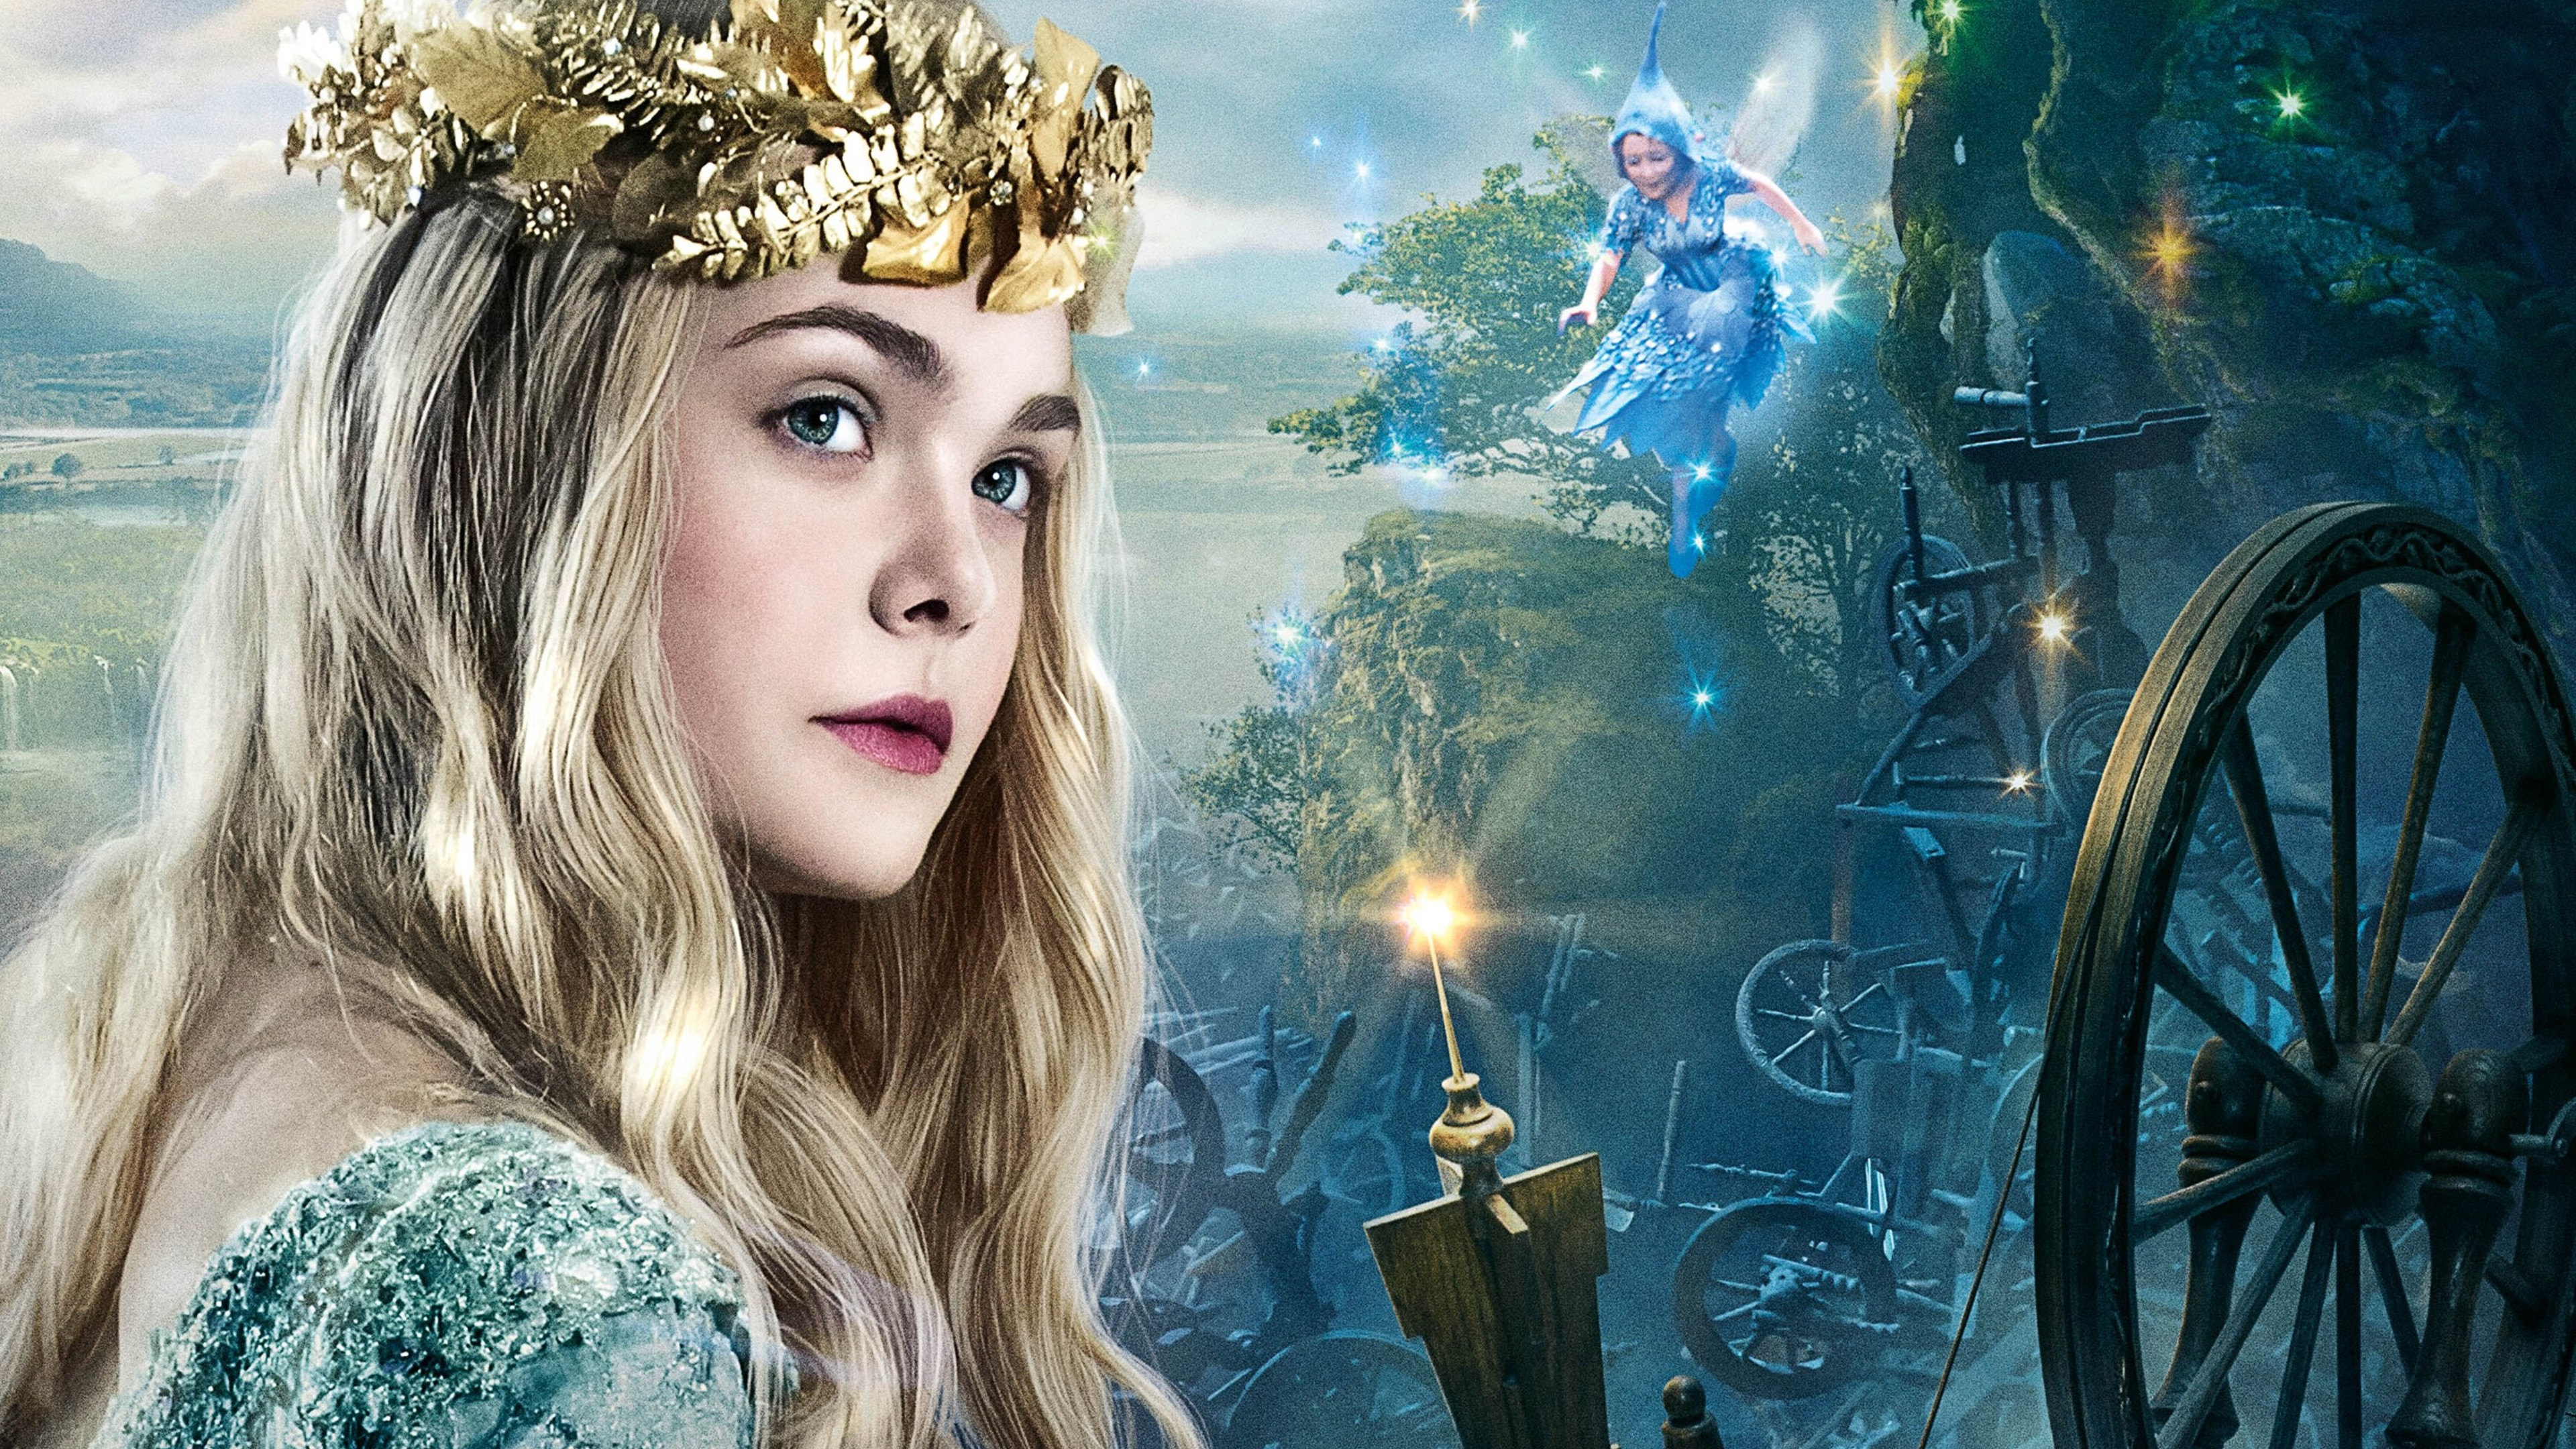 elle fanning as princess aurora 1536855907 - Elle Fanning As Princess Aurora - princess wallpapers, girls wallpapers, elle fanning wallpapers, celebrities wallpapers